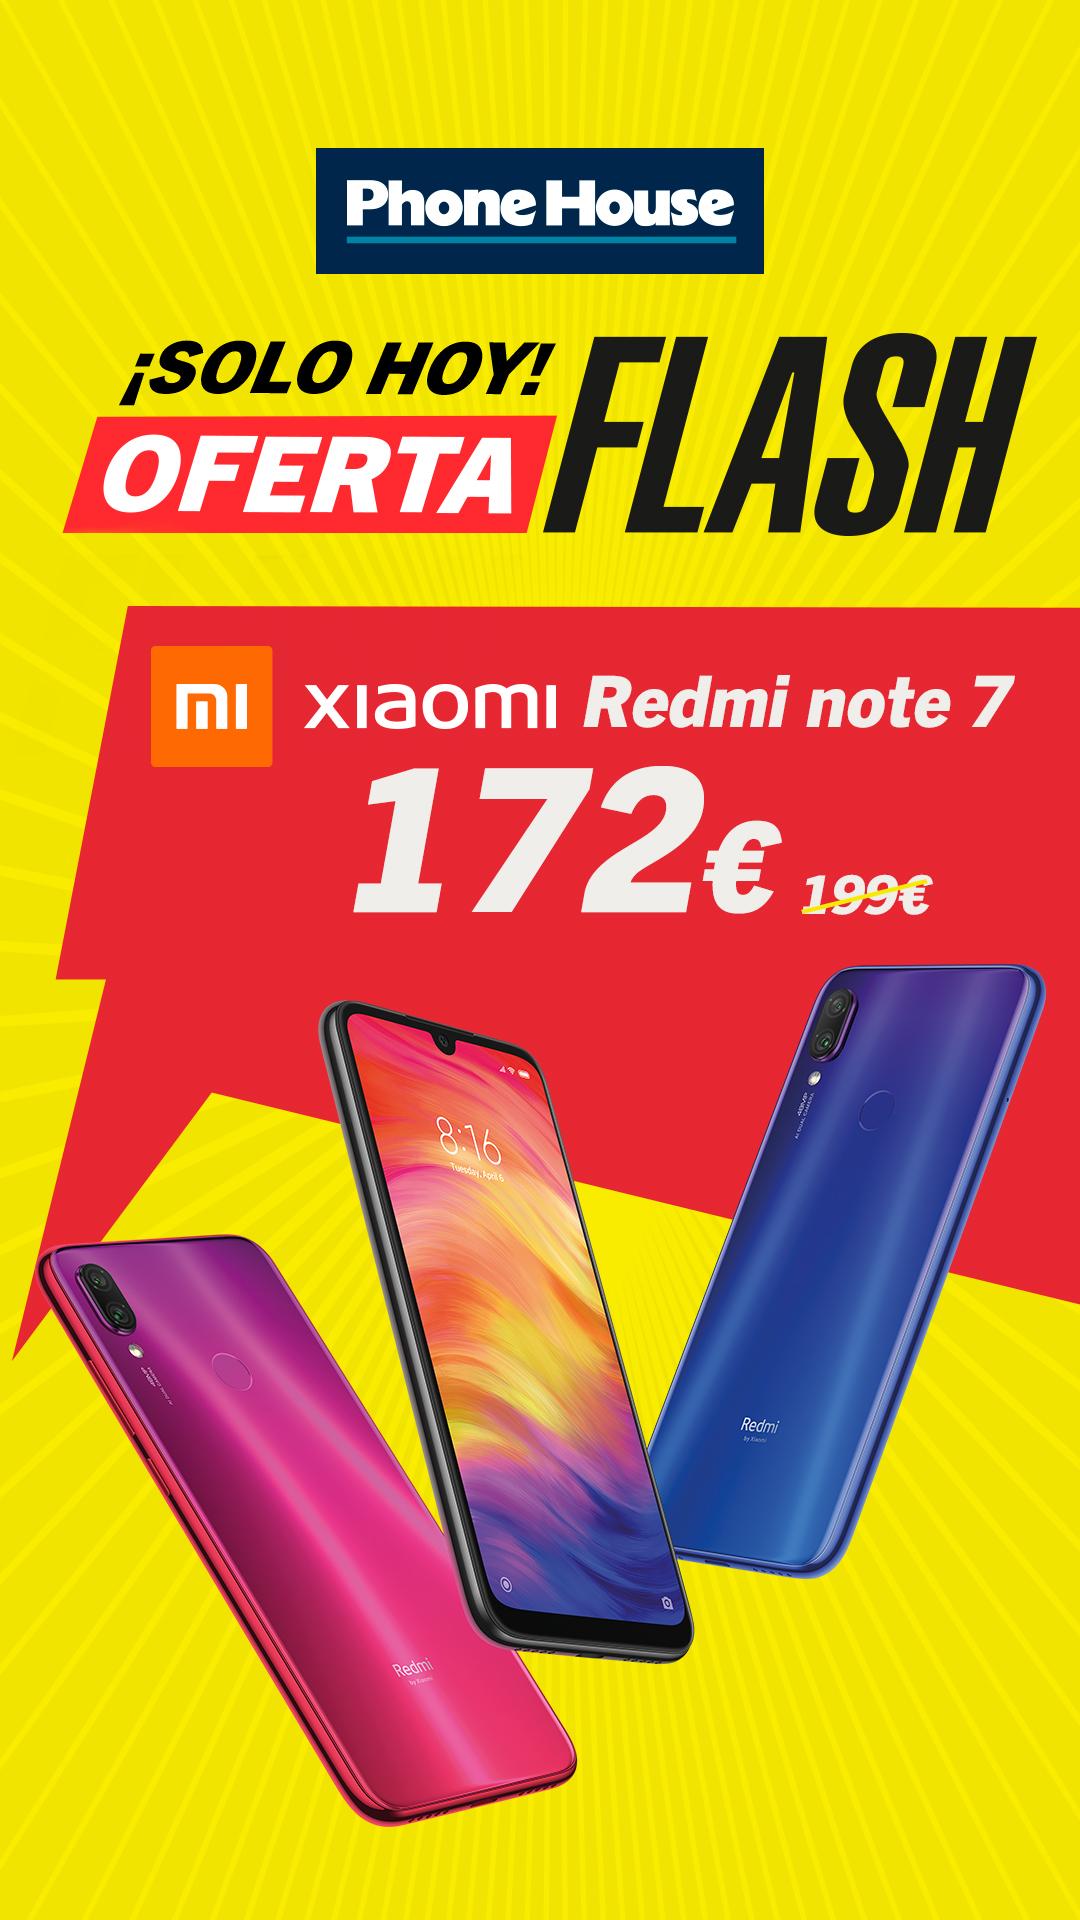 Oferta Flash Xiaomi Redmi Note 7